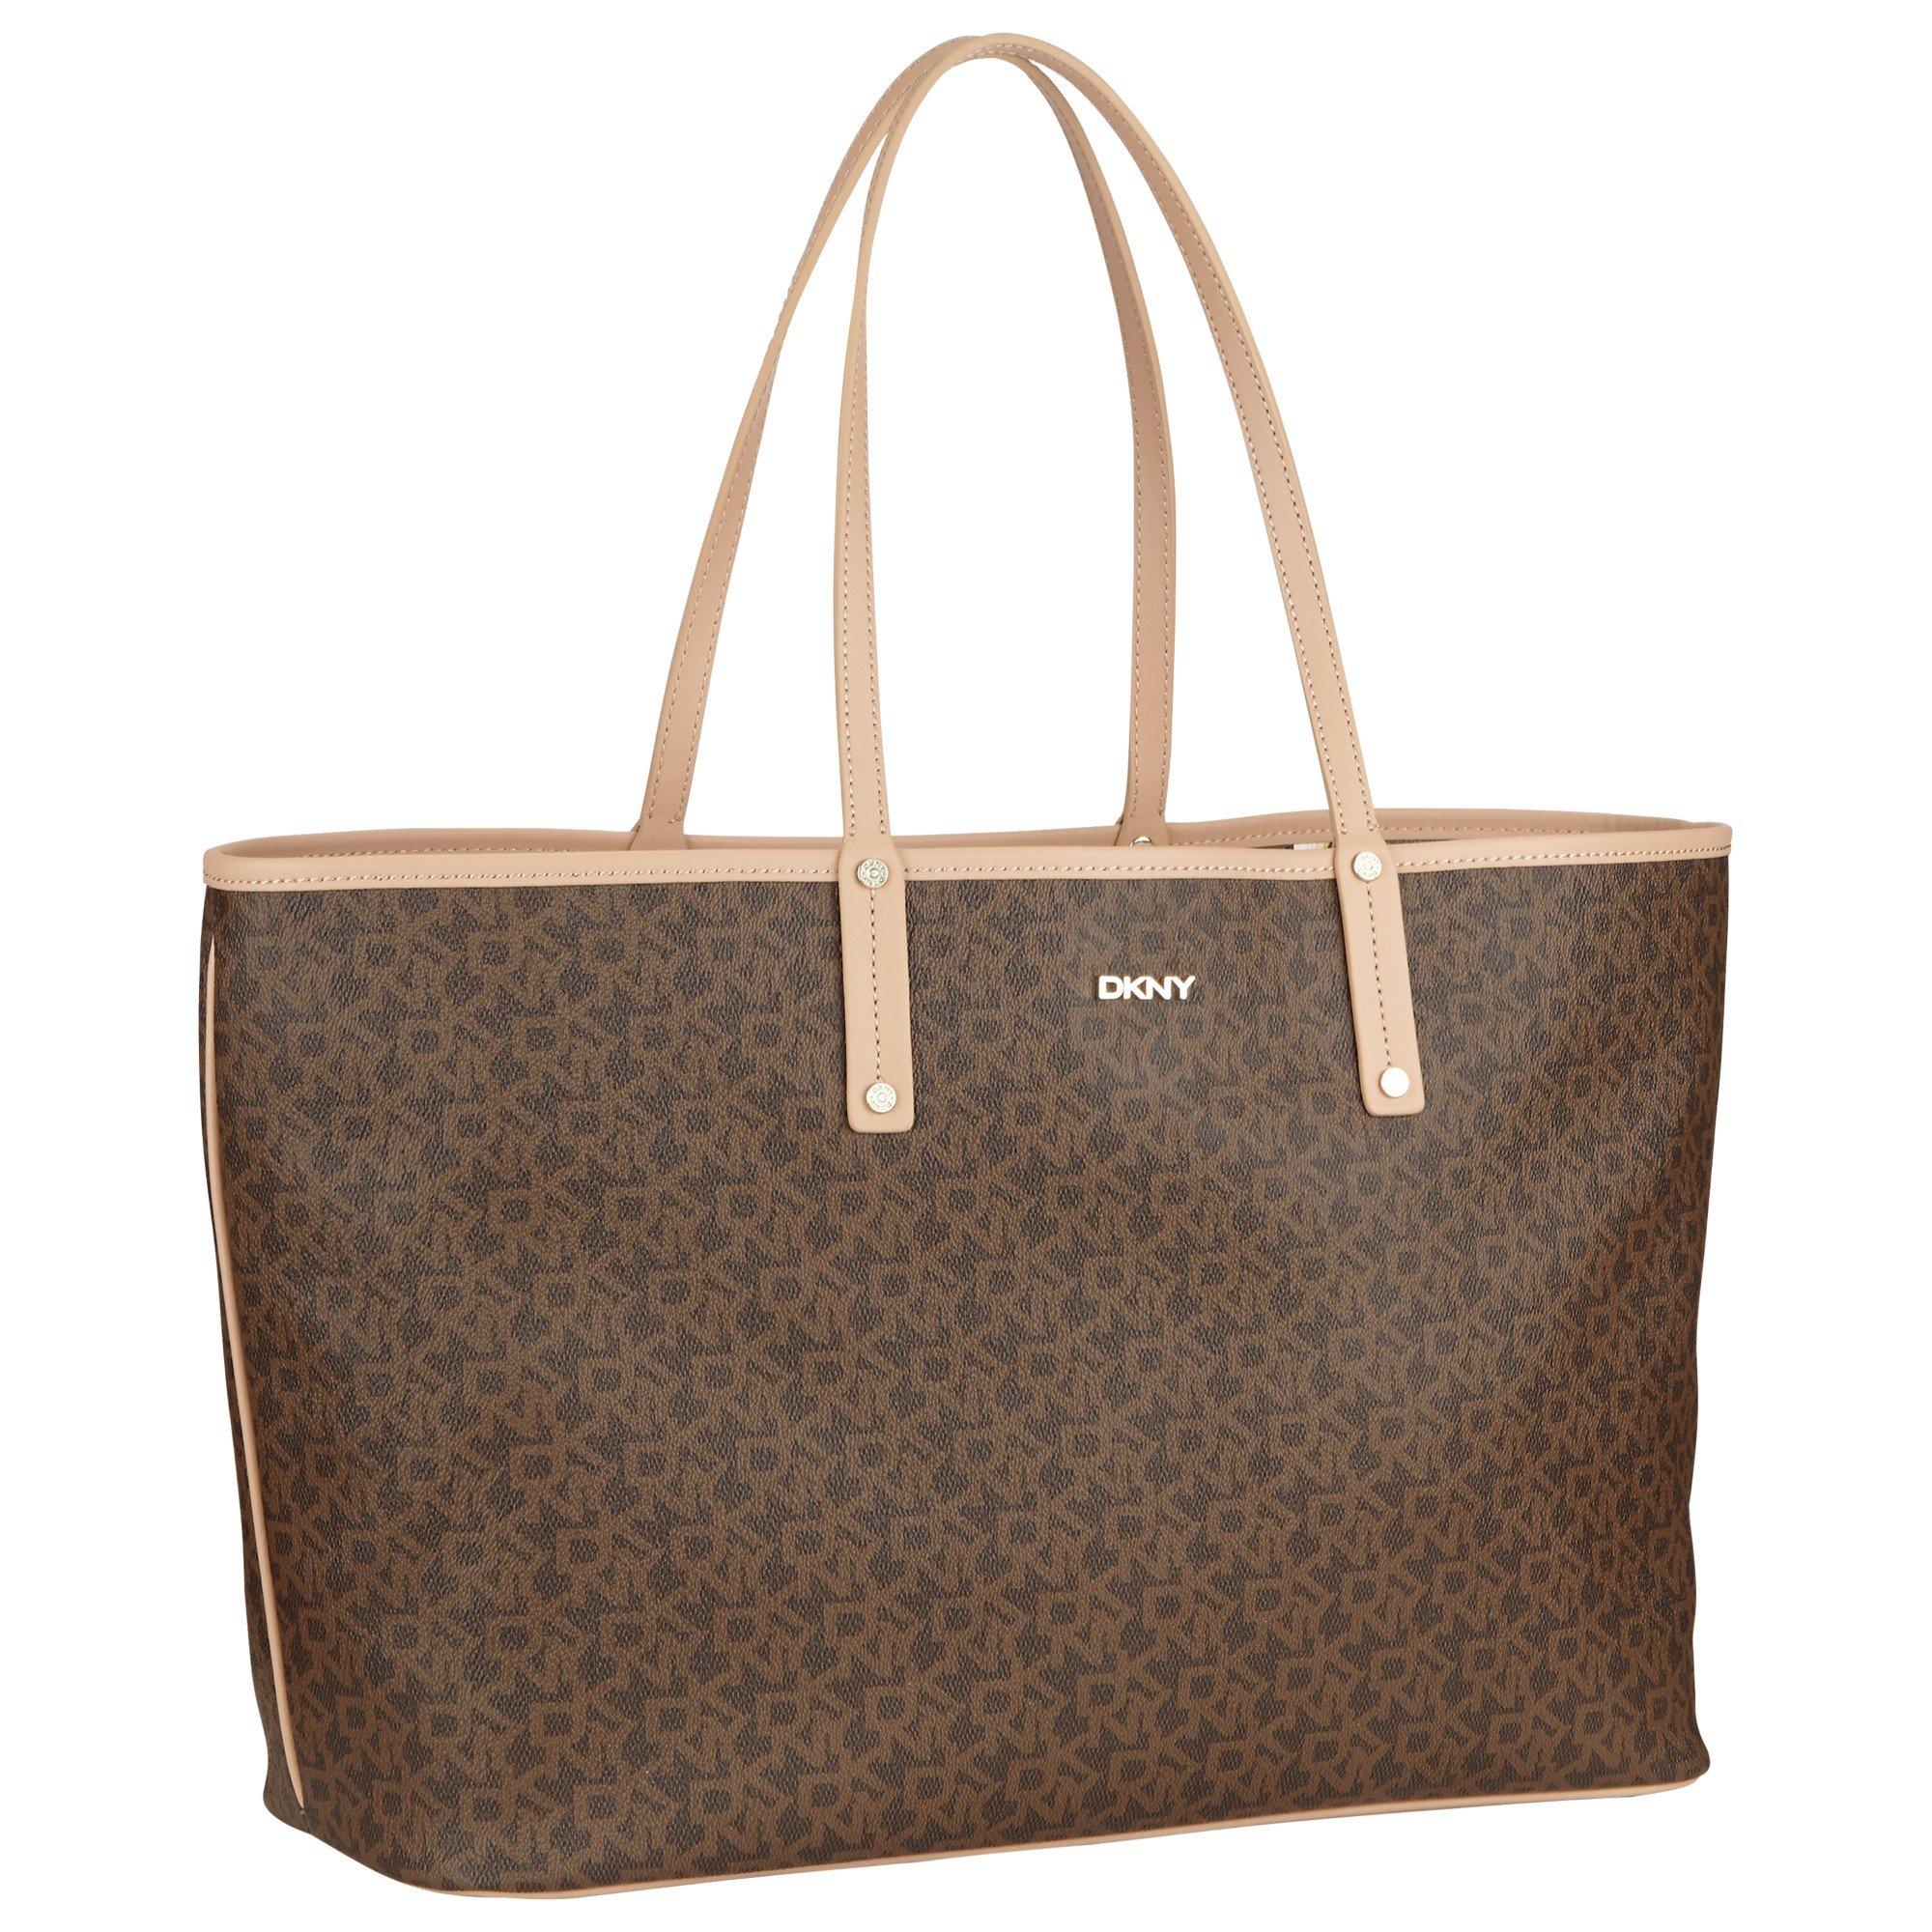 DKNY reversible tote bag Deals Cheap Price Cheap Wide Range Of Sale Countdown Package Sale 100% Authentic 2JWm2du